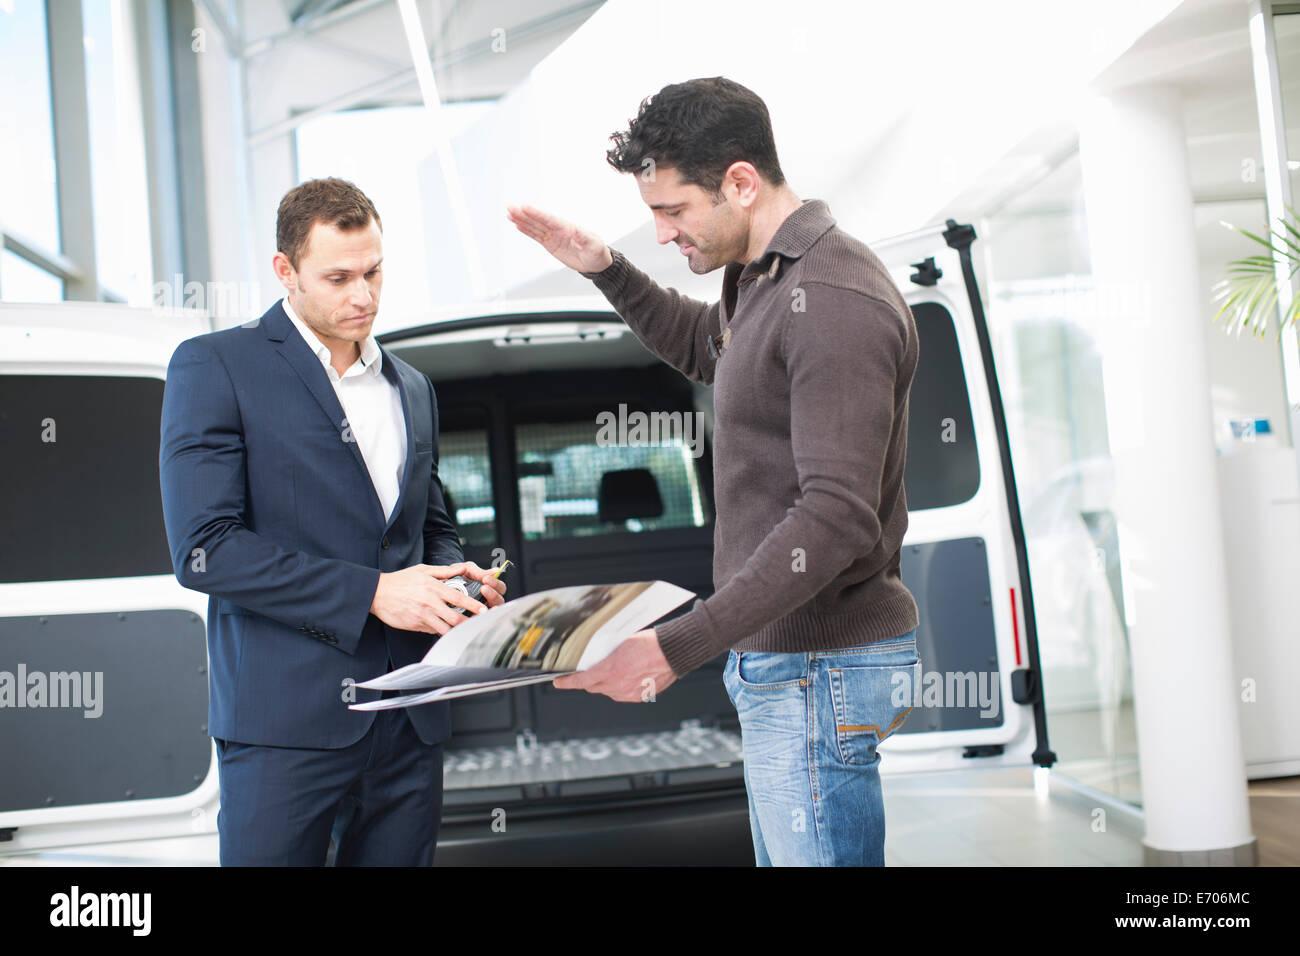 Customer questioning salesman in car dealership - Stock Image